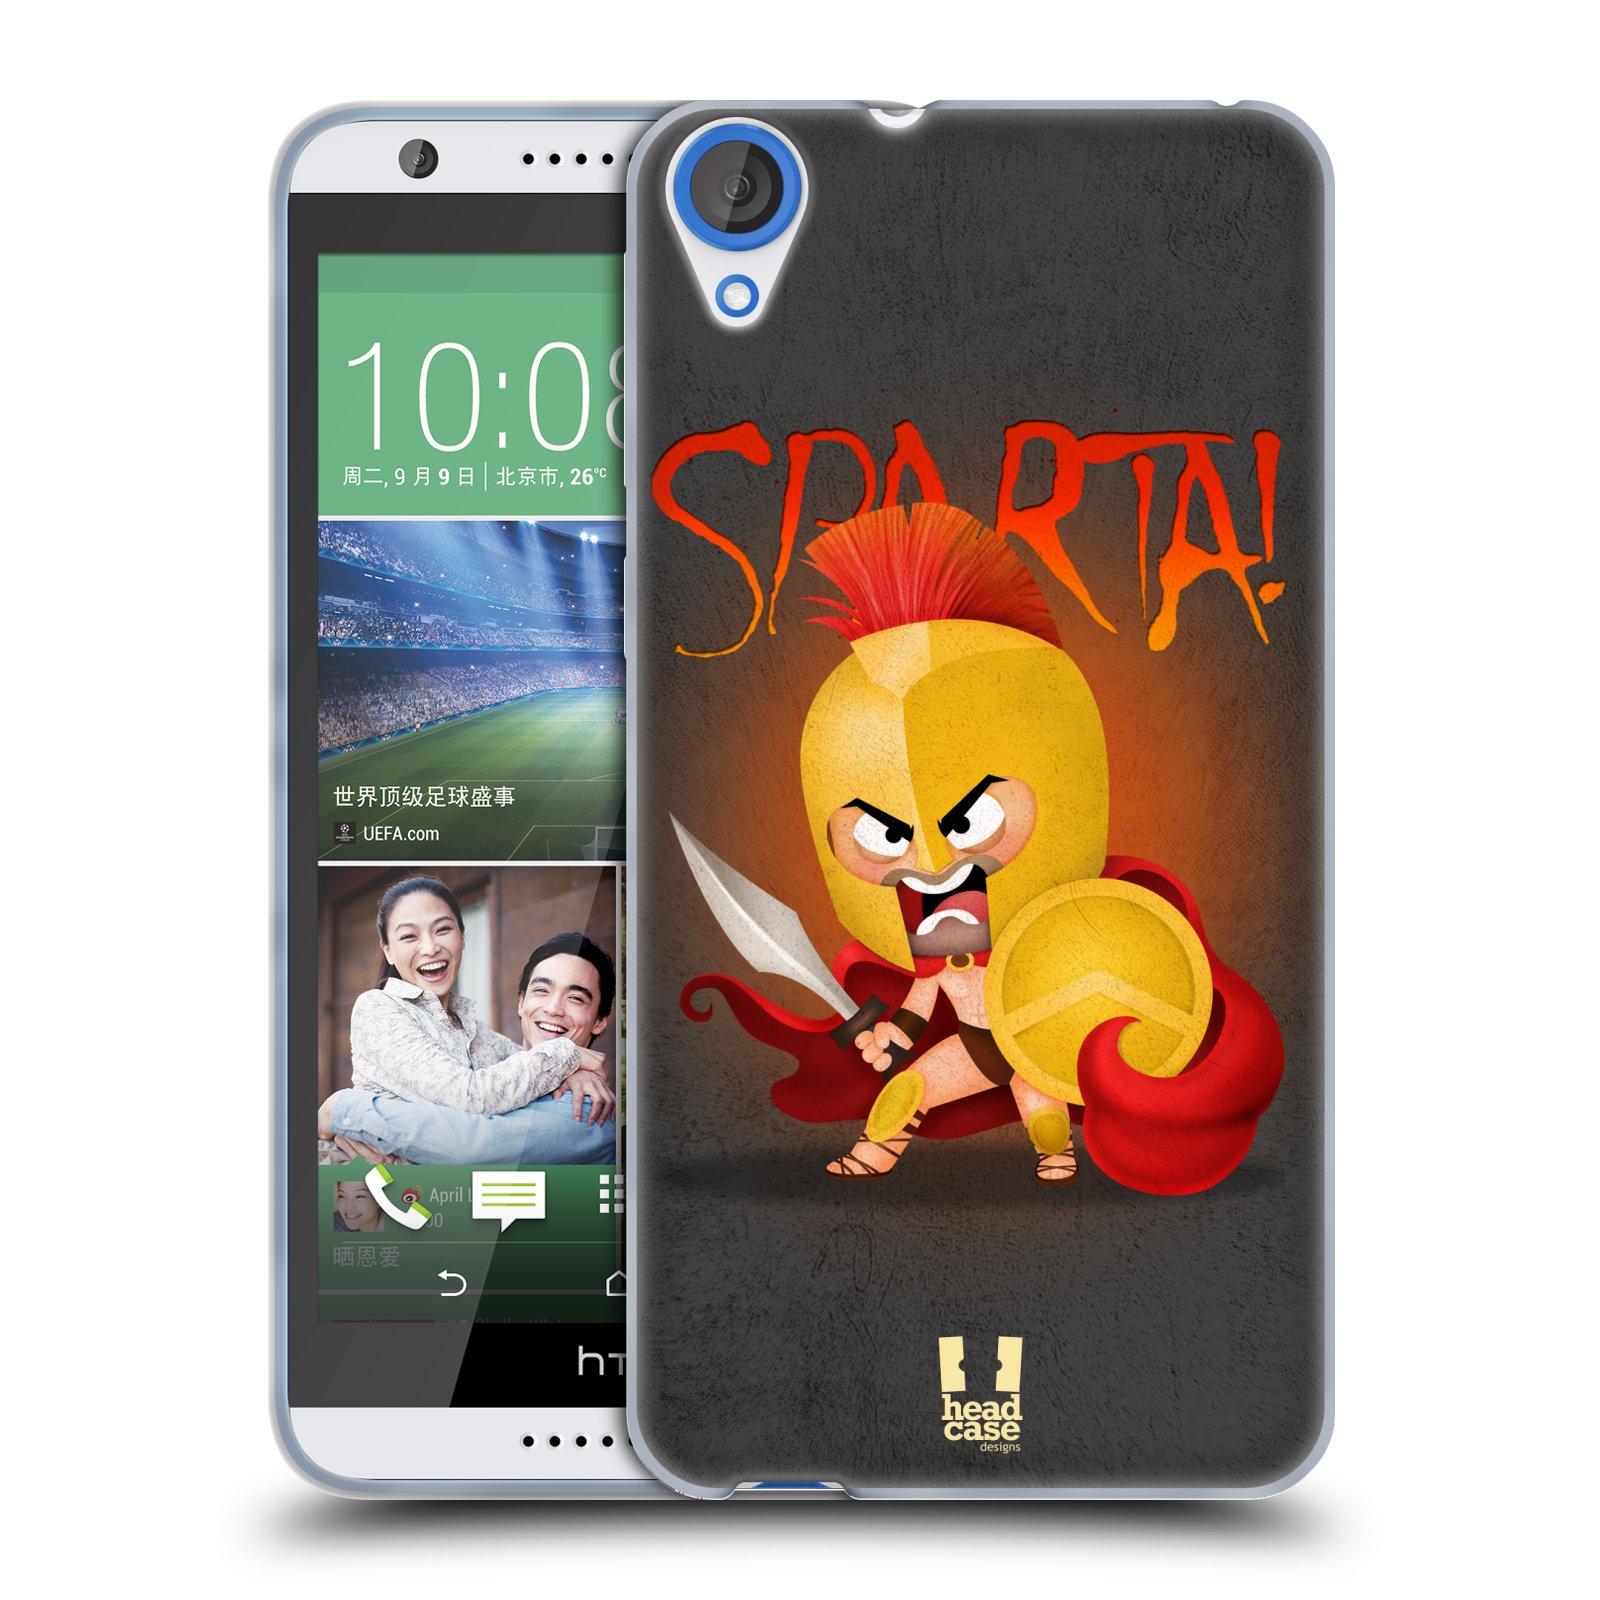 Silikonové pouzdro na mobil HTC Desire 820 HEAD CASE Sparta (Silikonový kryt či obal na mobilní telefon HTC Desire 820)